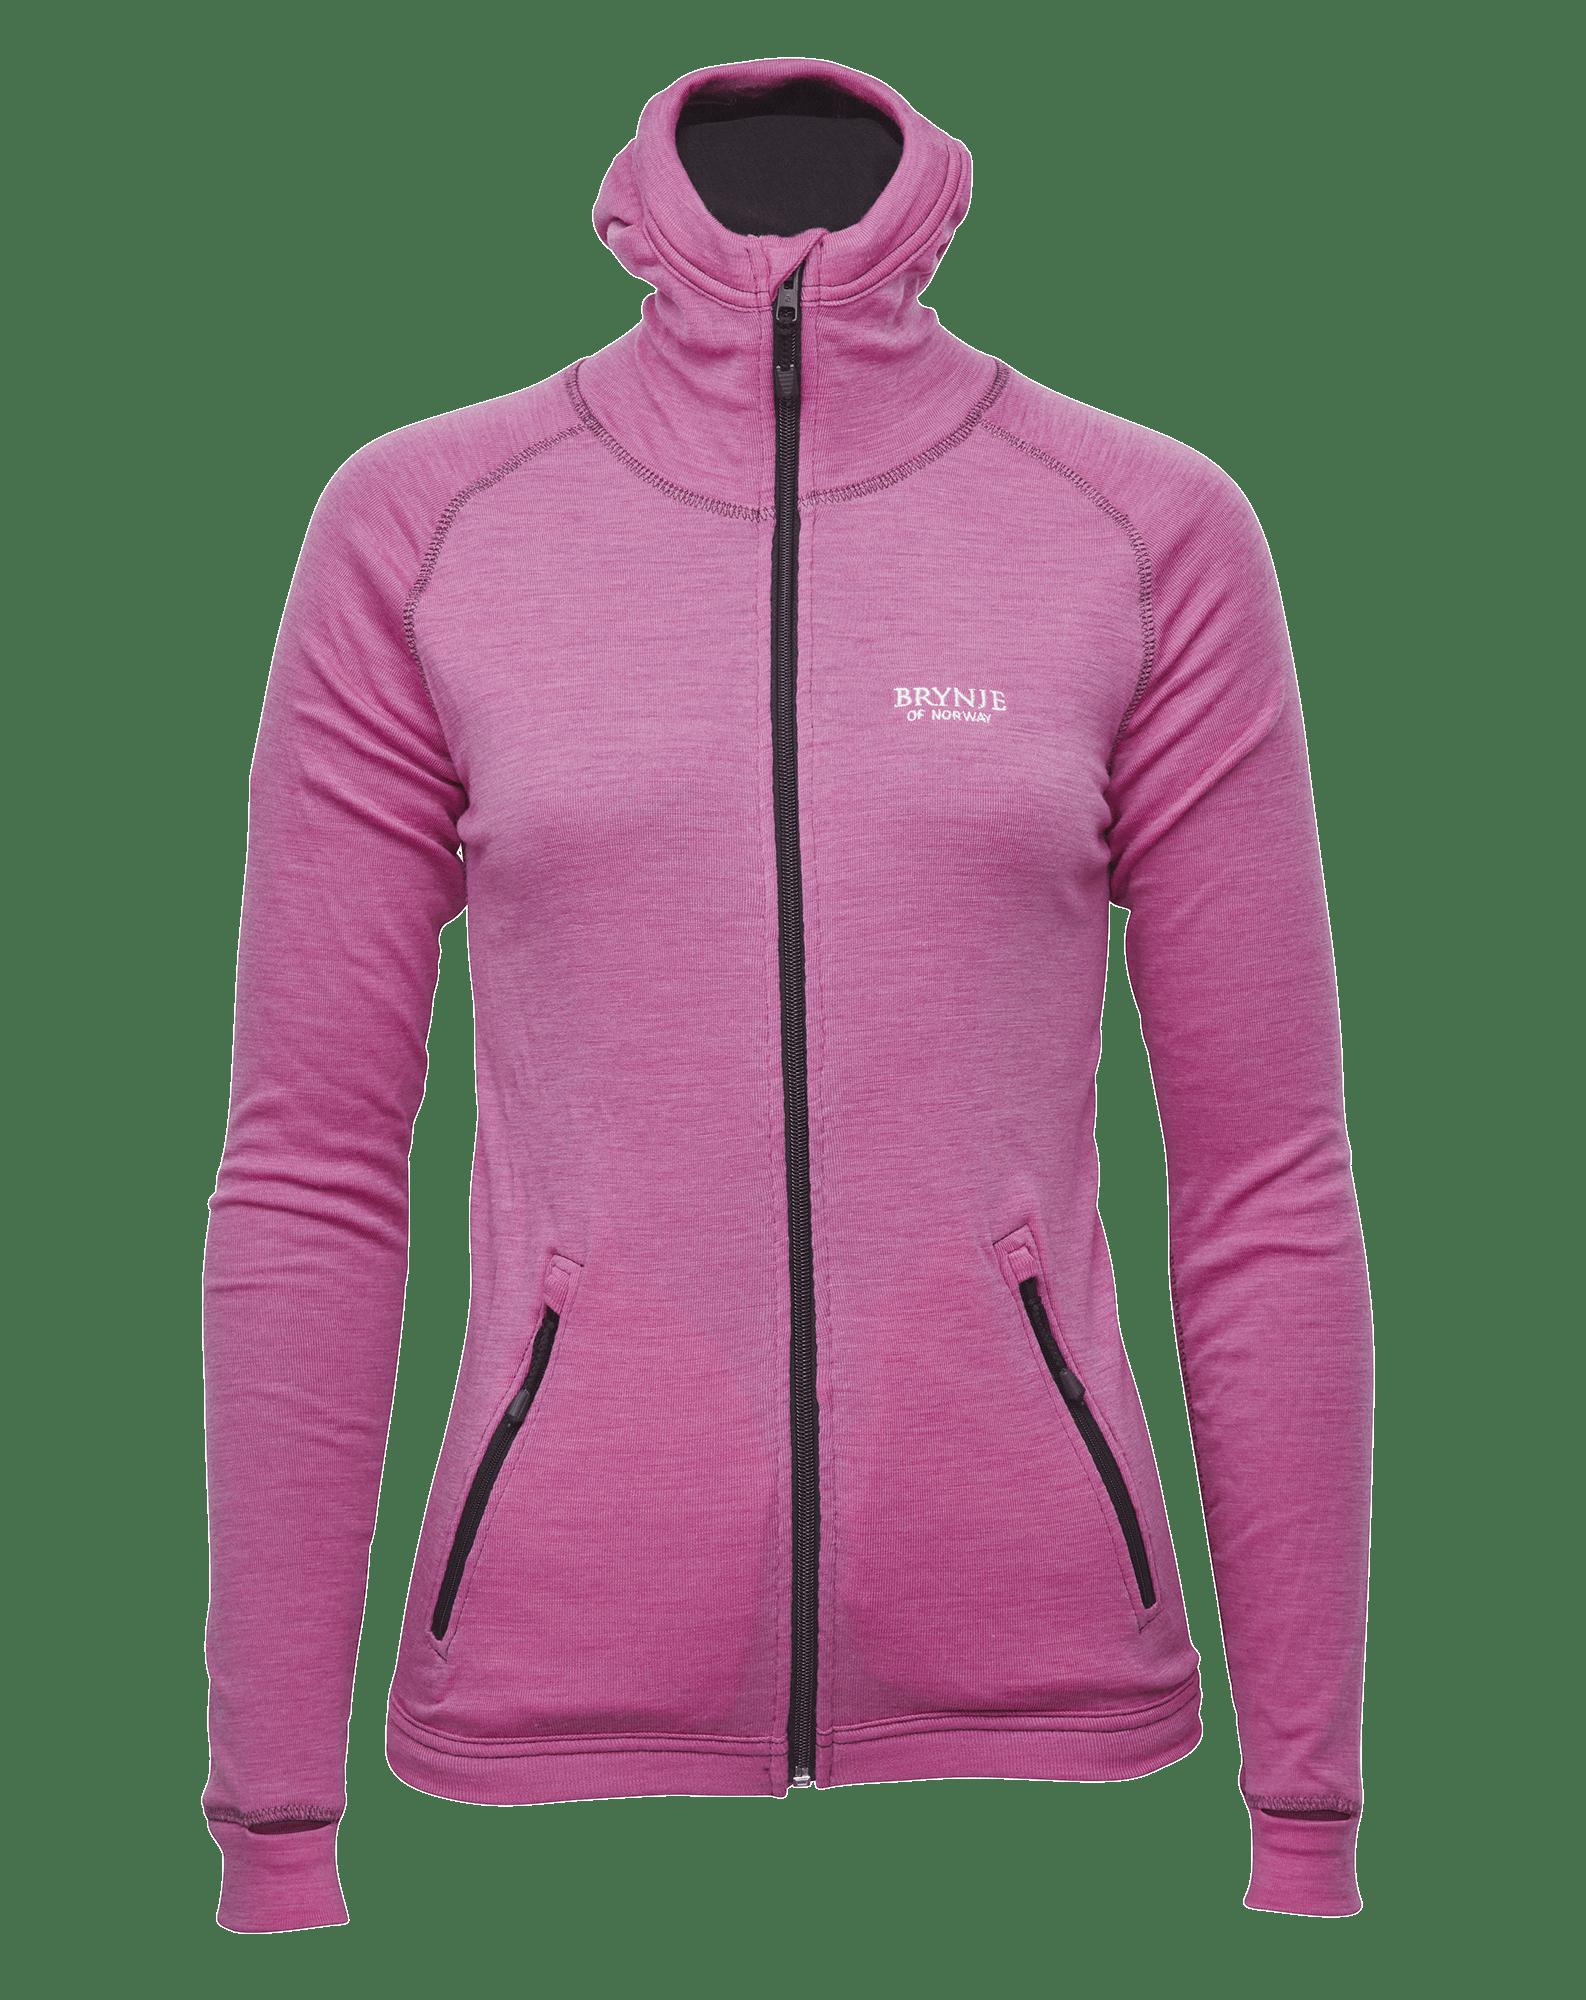 Arctic jakke med hette fra Brynje Lilla | GirlofNorth.no